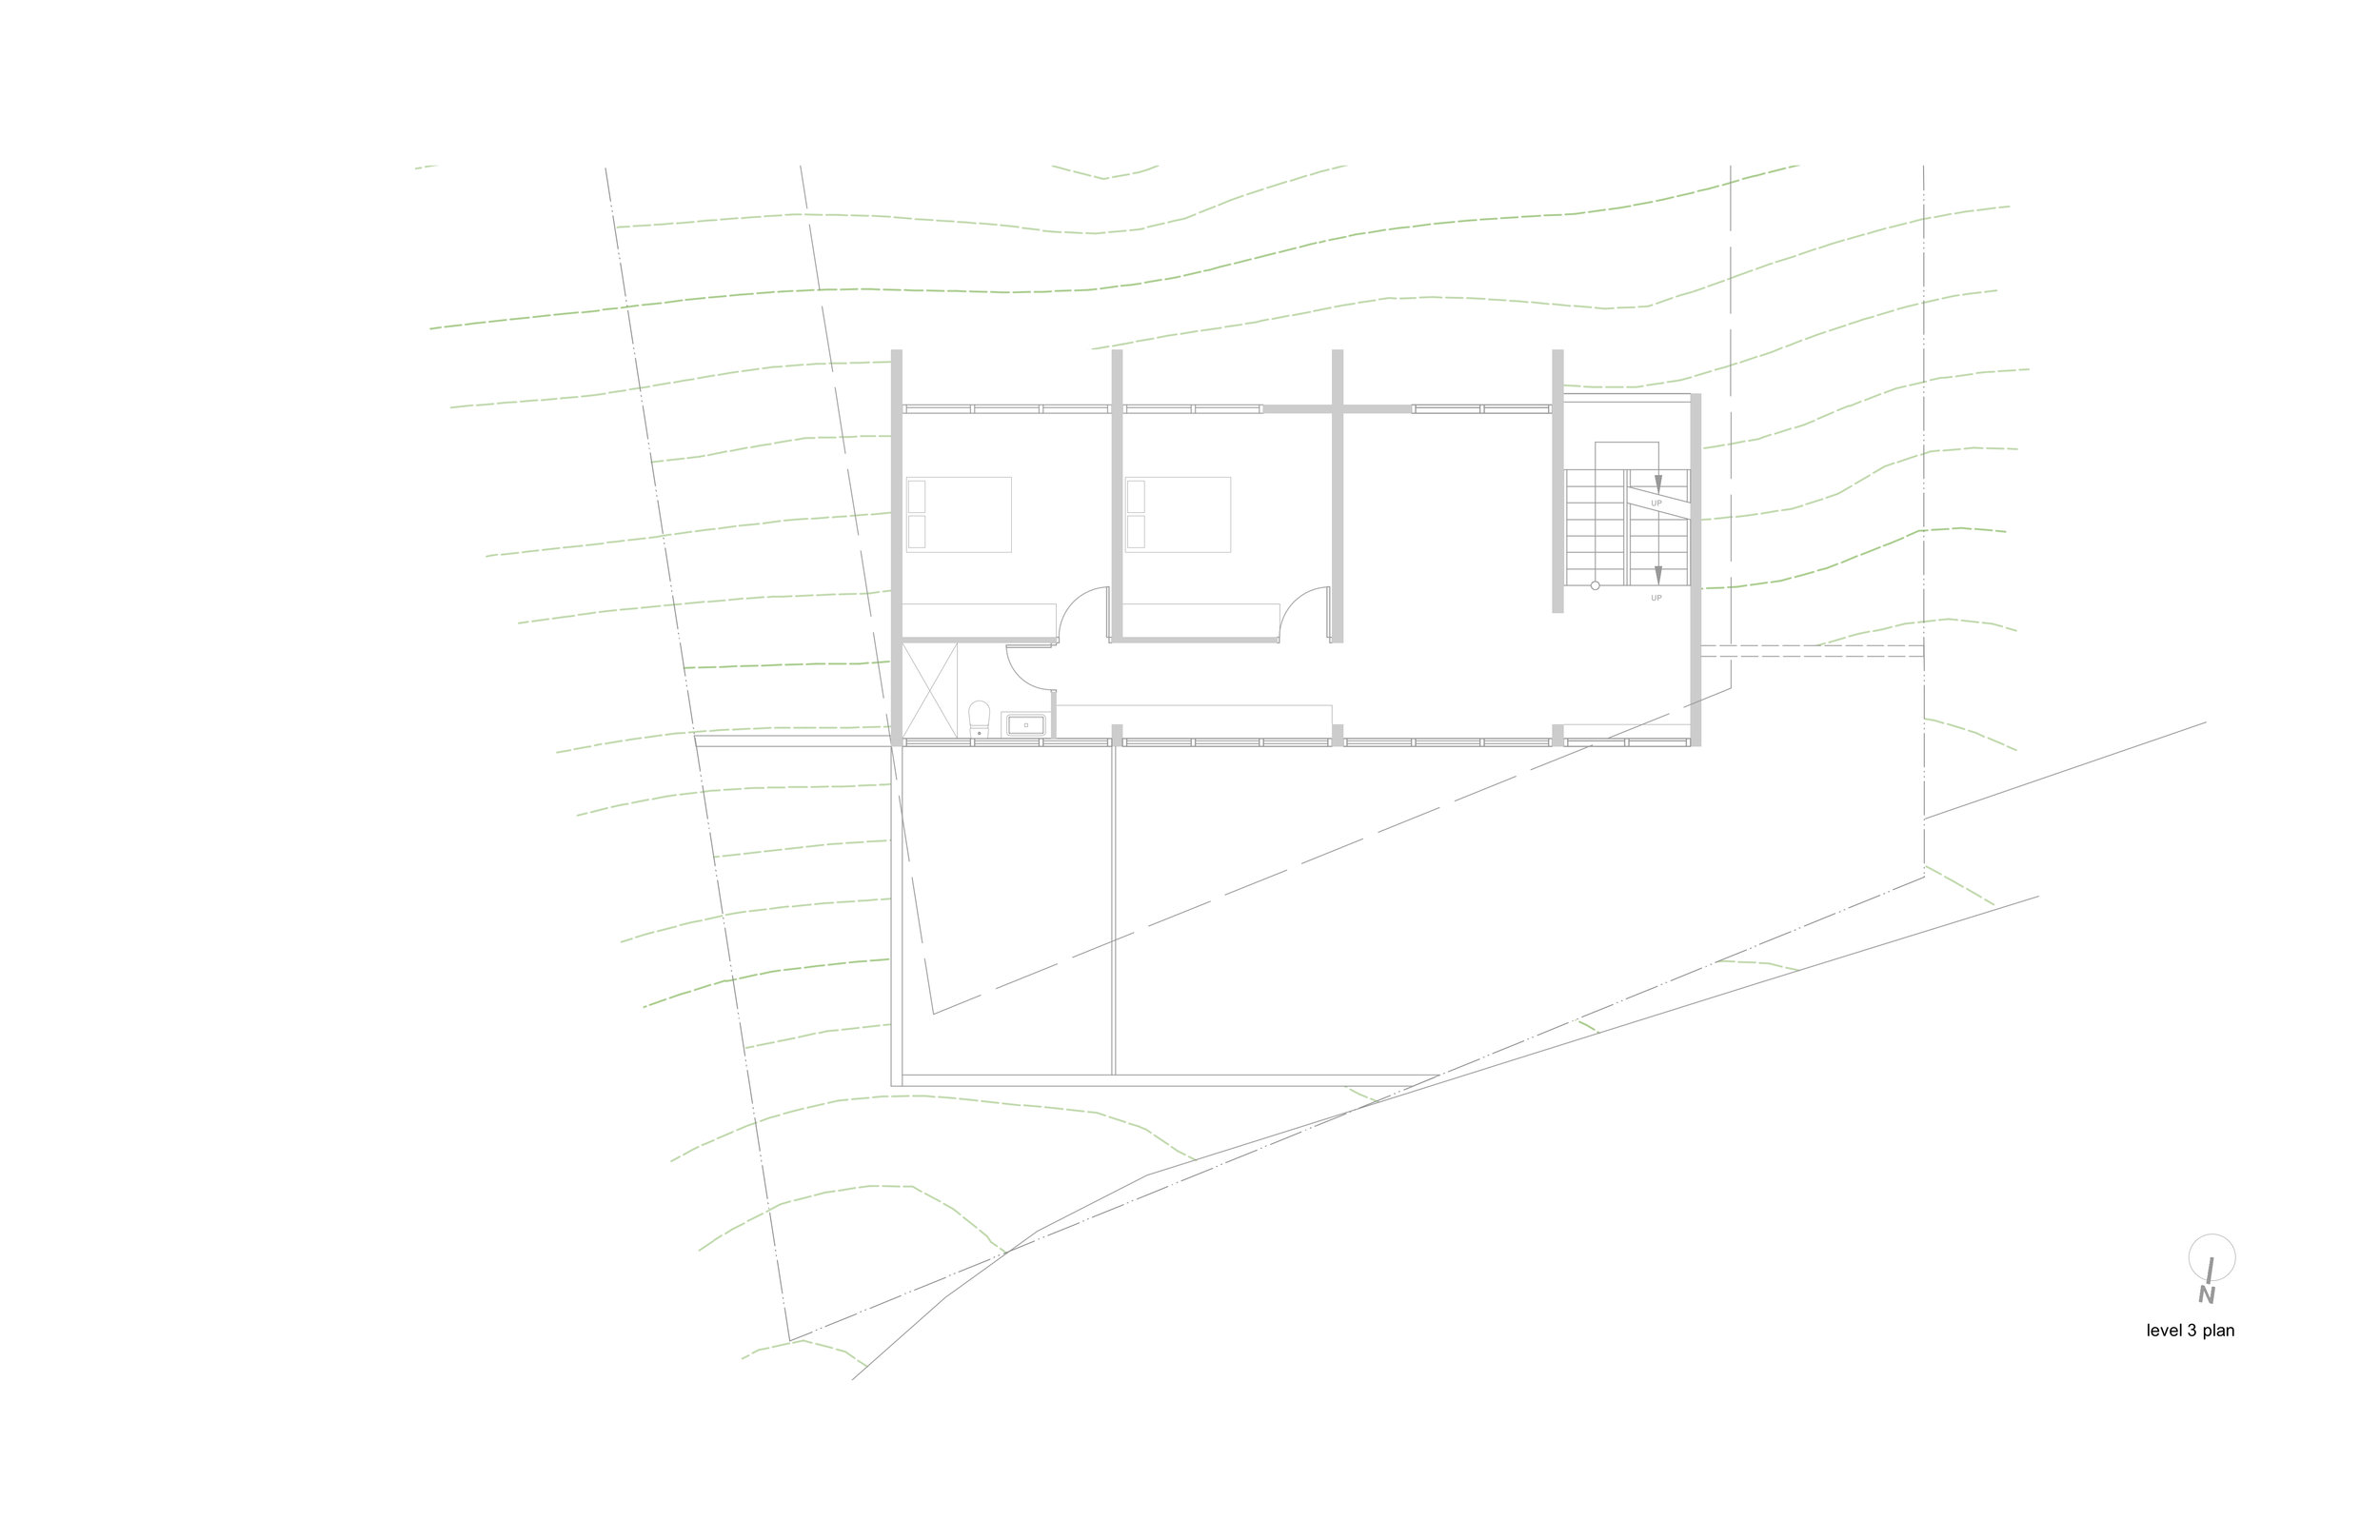 level 3 plan